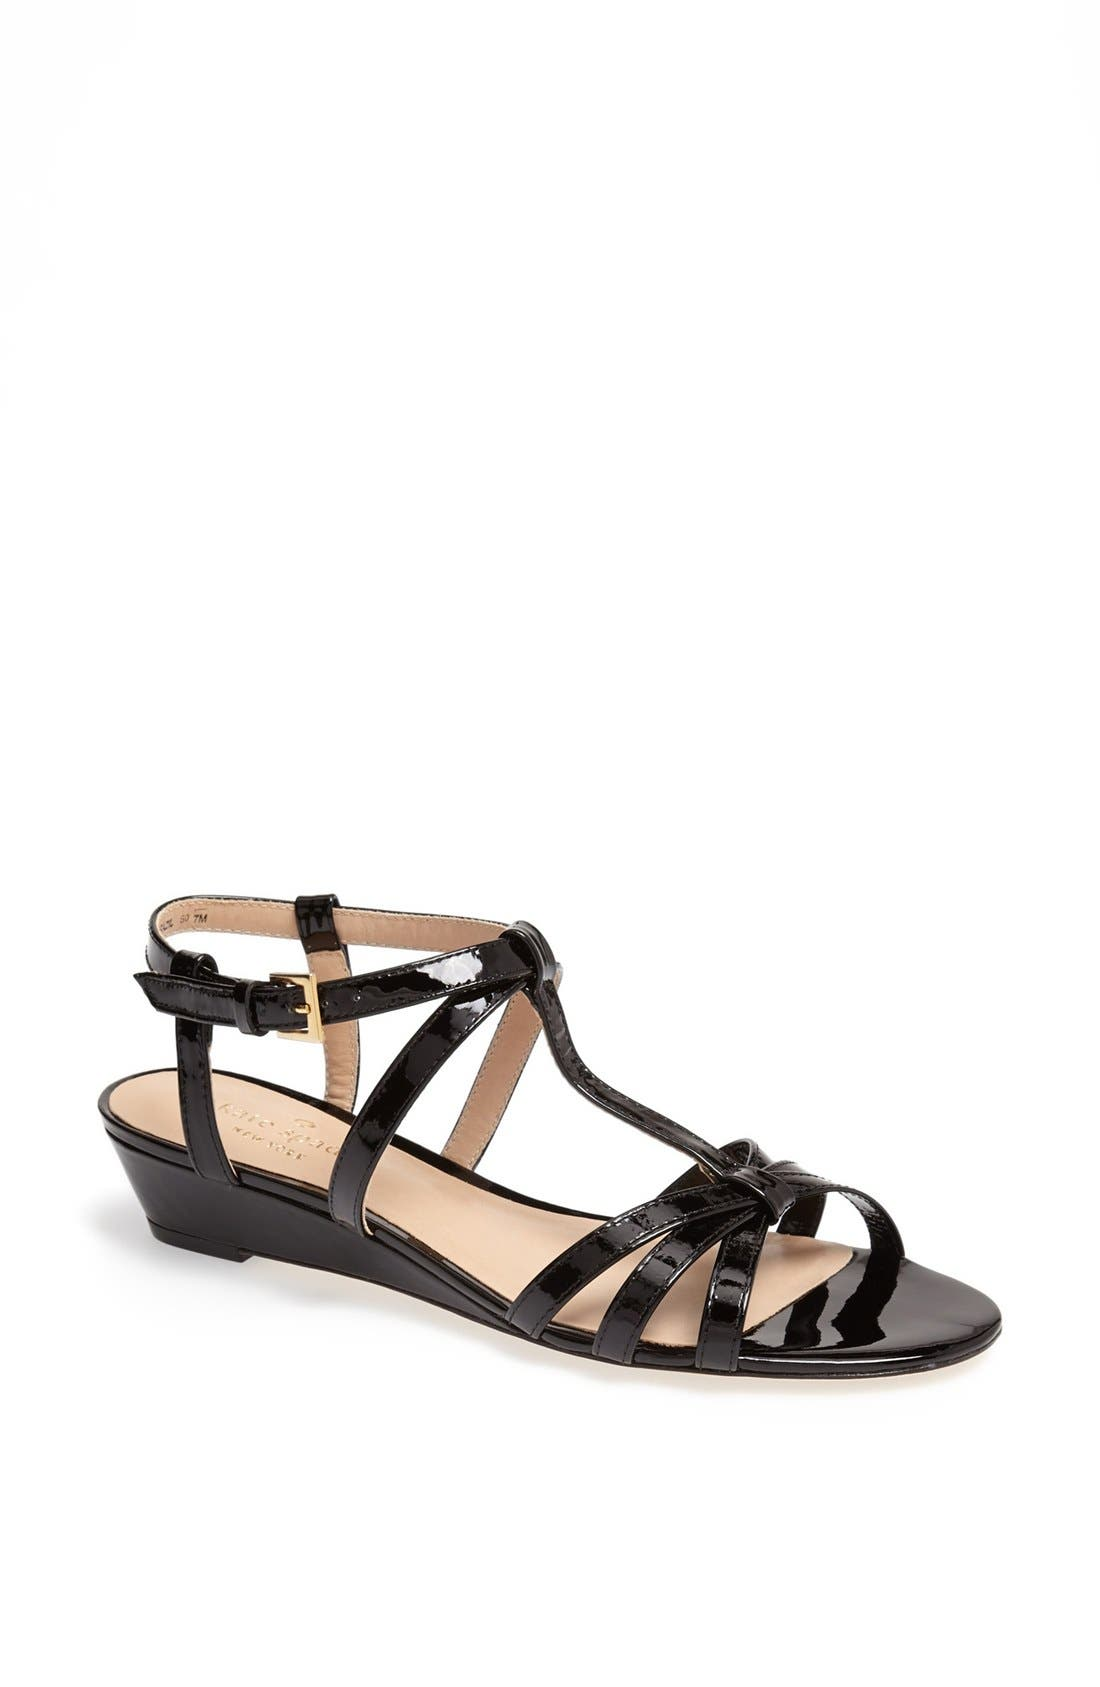 Main Image - kate spade new york 'vetta' wedge sandal